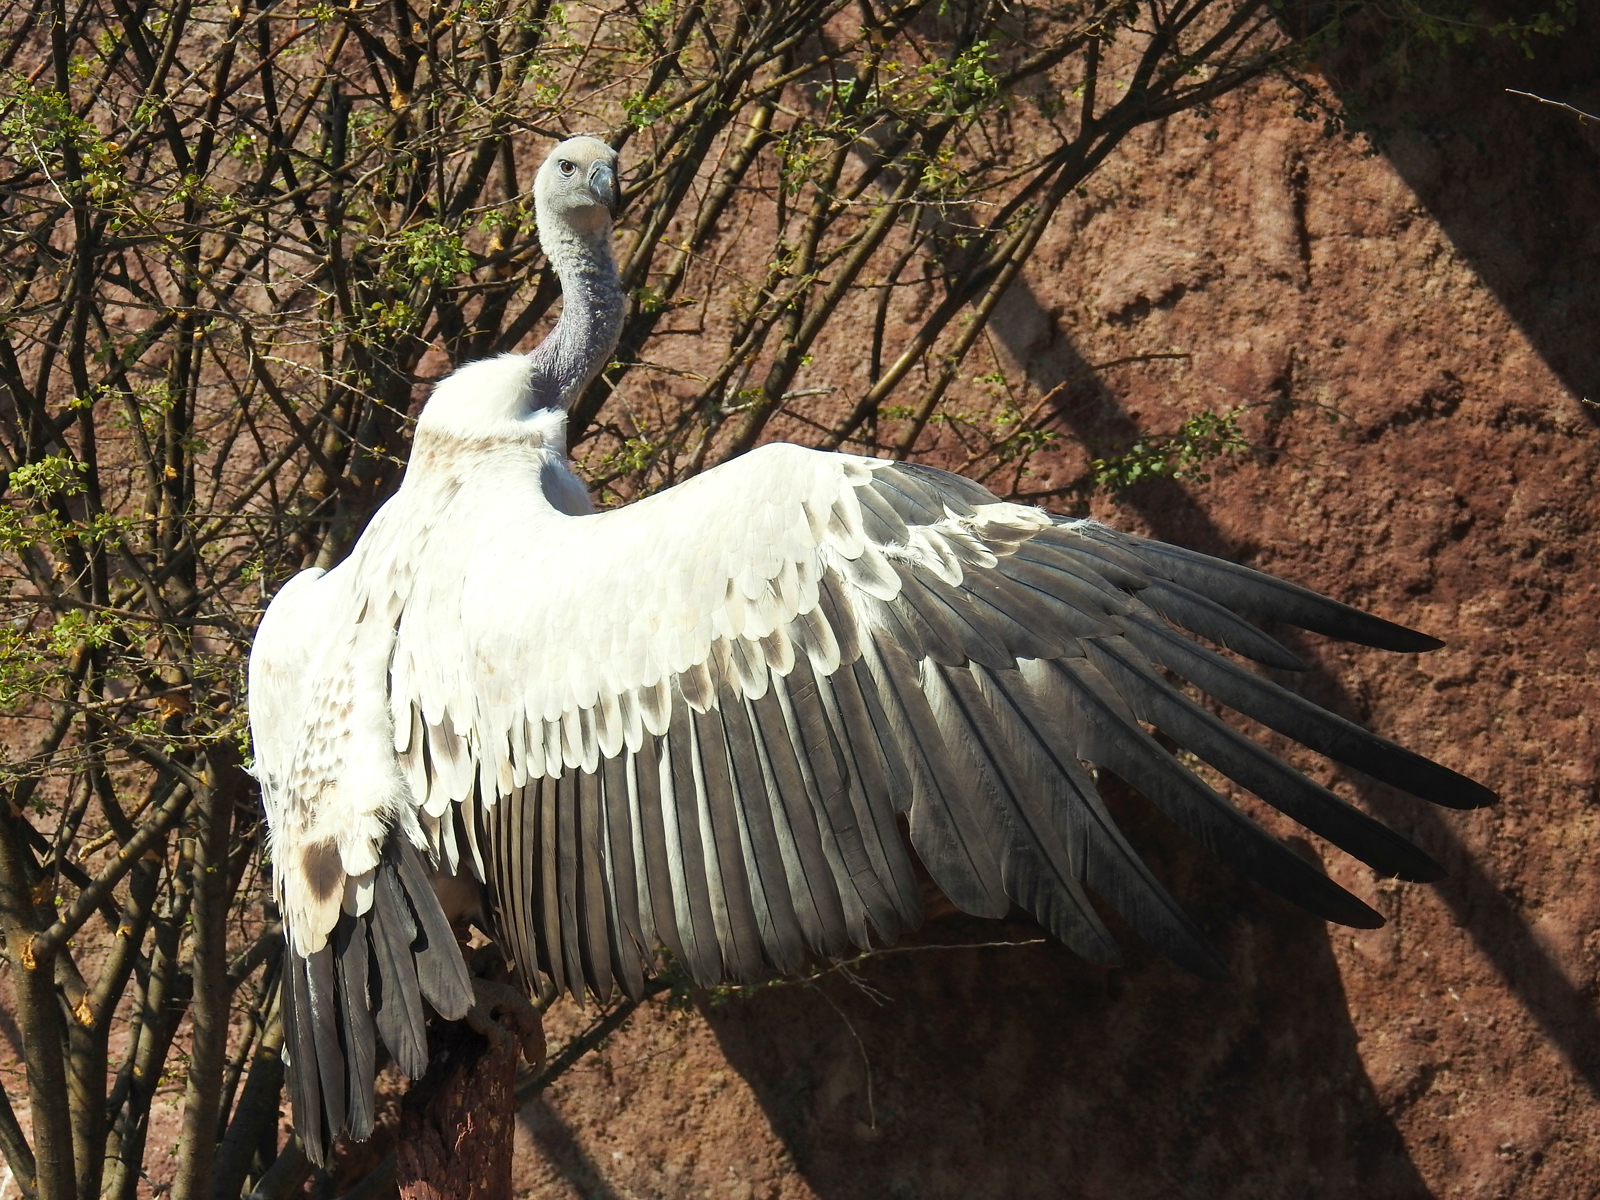 Cape vulture sunning itself